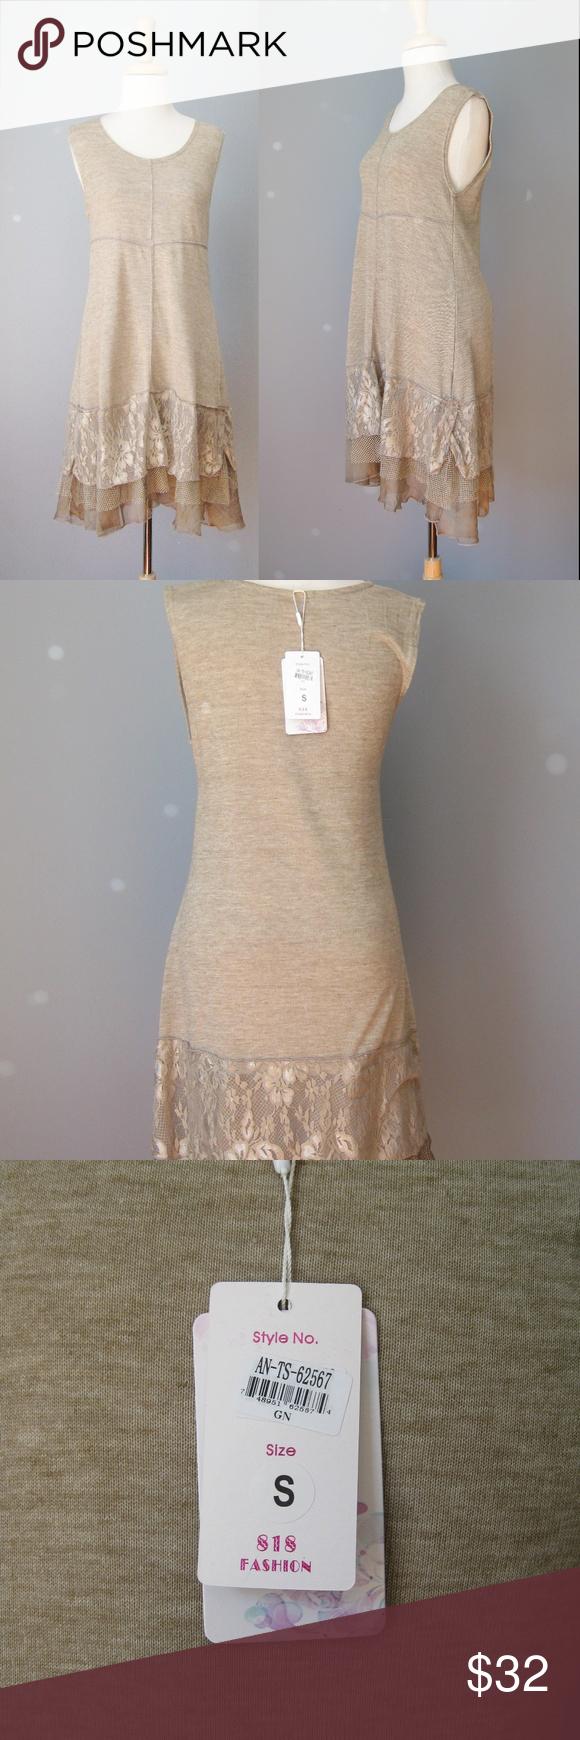 92eaec8854 NWT Pretty Angel Dress Taupe Lace trim Tank Dress NWT